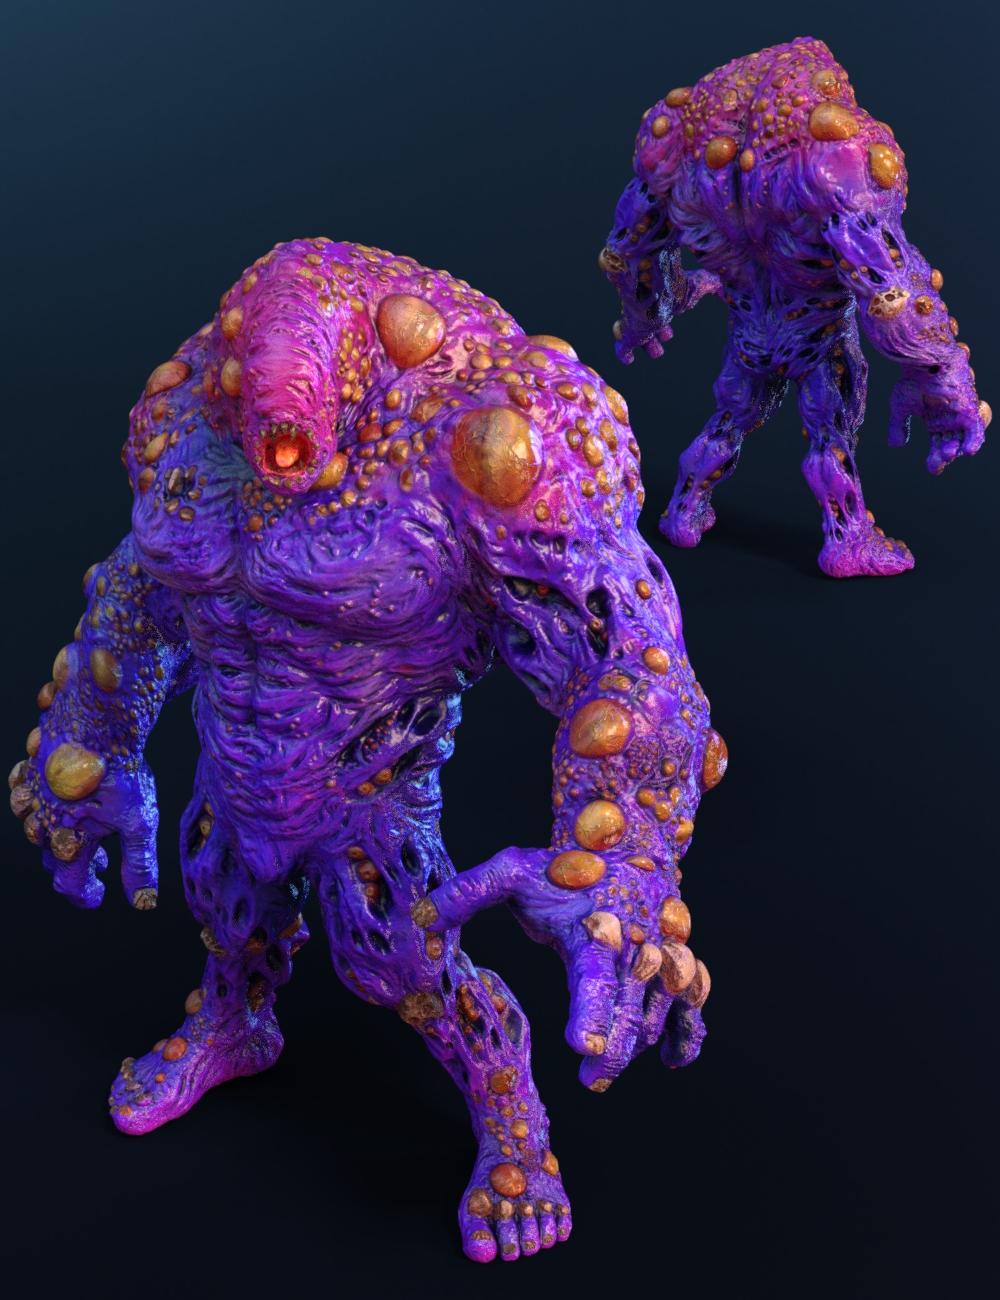 Overkill HD for Genesis 8 Males by: JoeQuick, 3D Models by Daz 3D